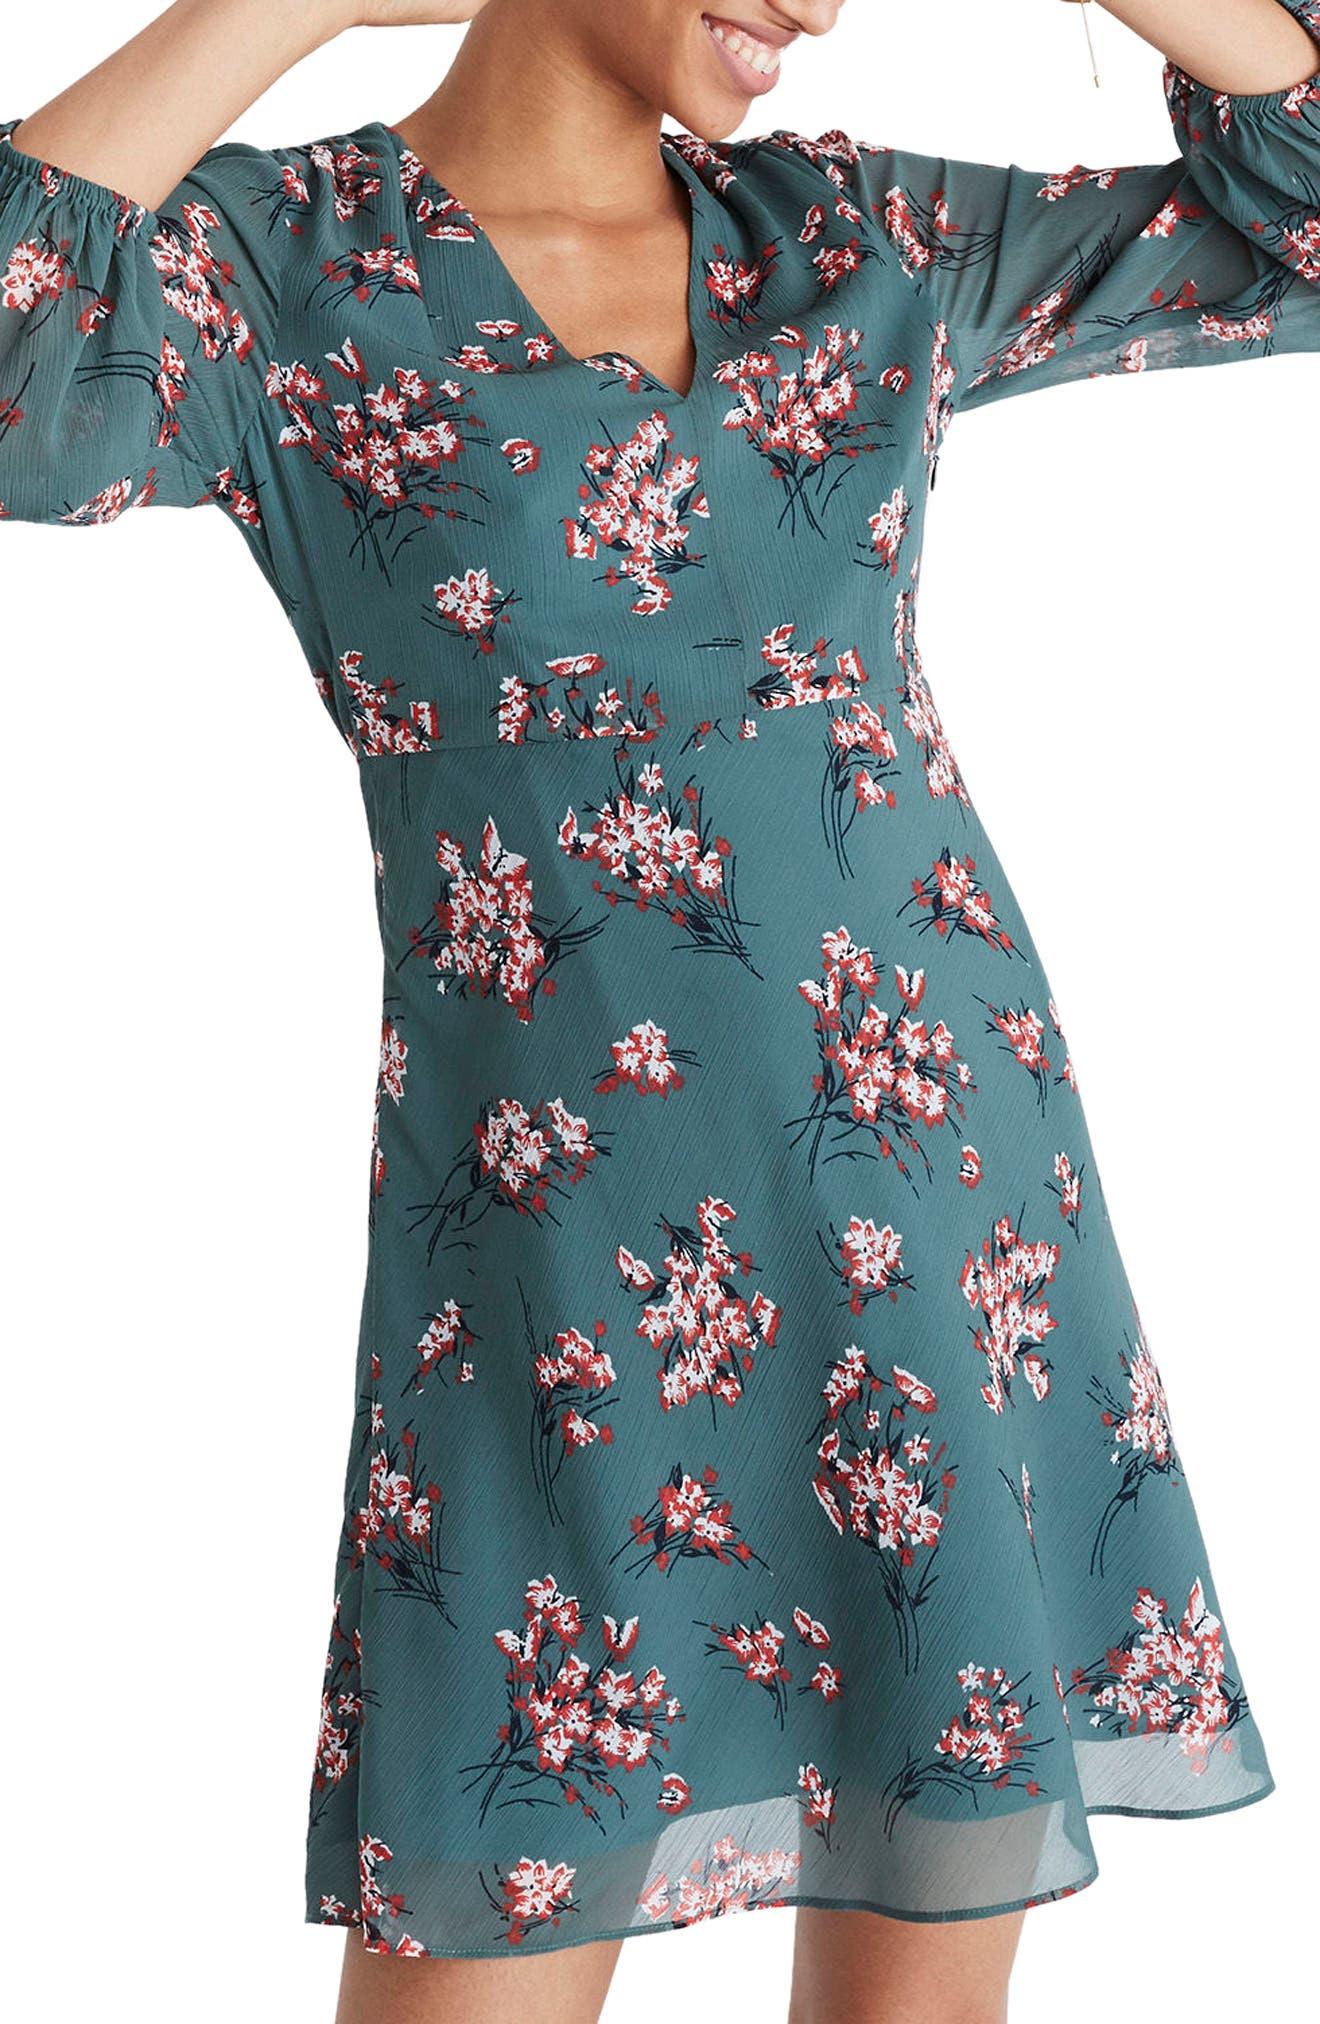 Madewell Marguerite Swing Dress